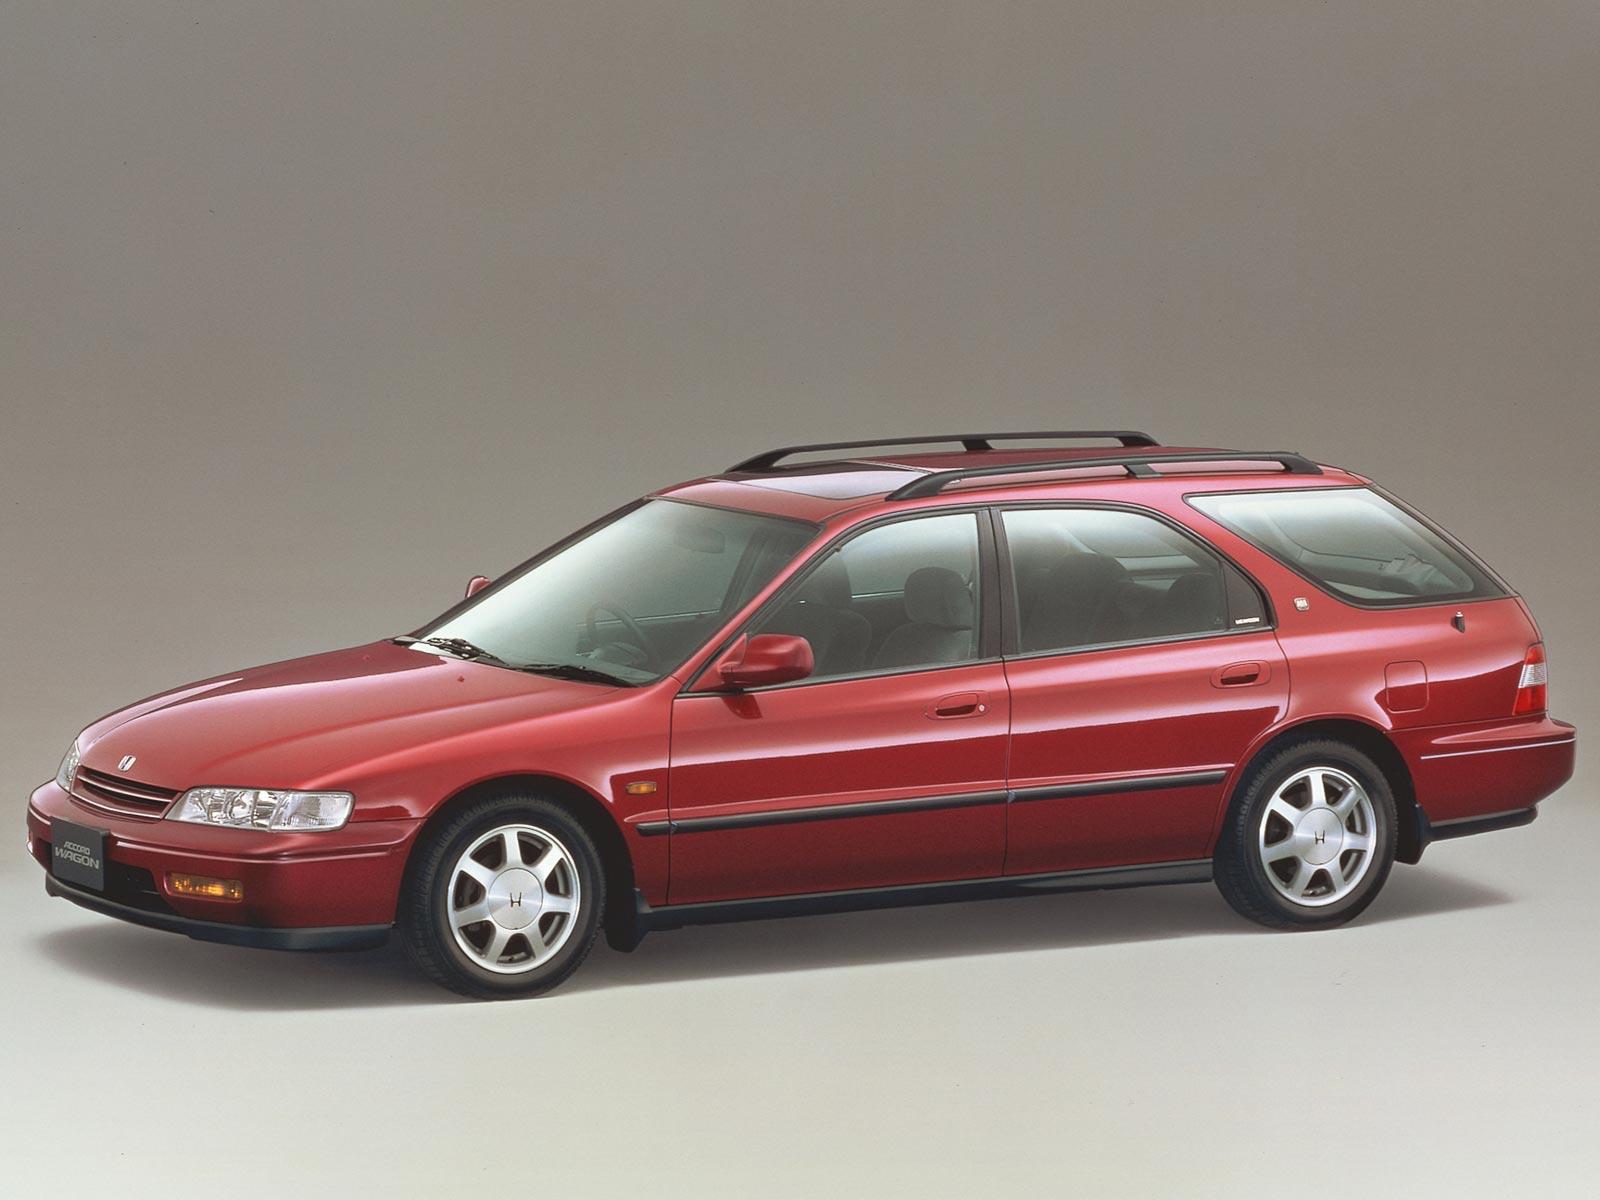 1993 1997 honda accord wagon us autoguru. Black Bedroom Furniture Sets. Home Design Ideas